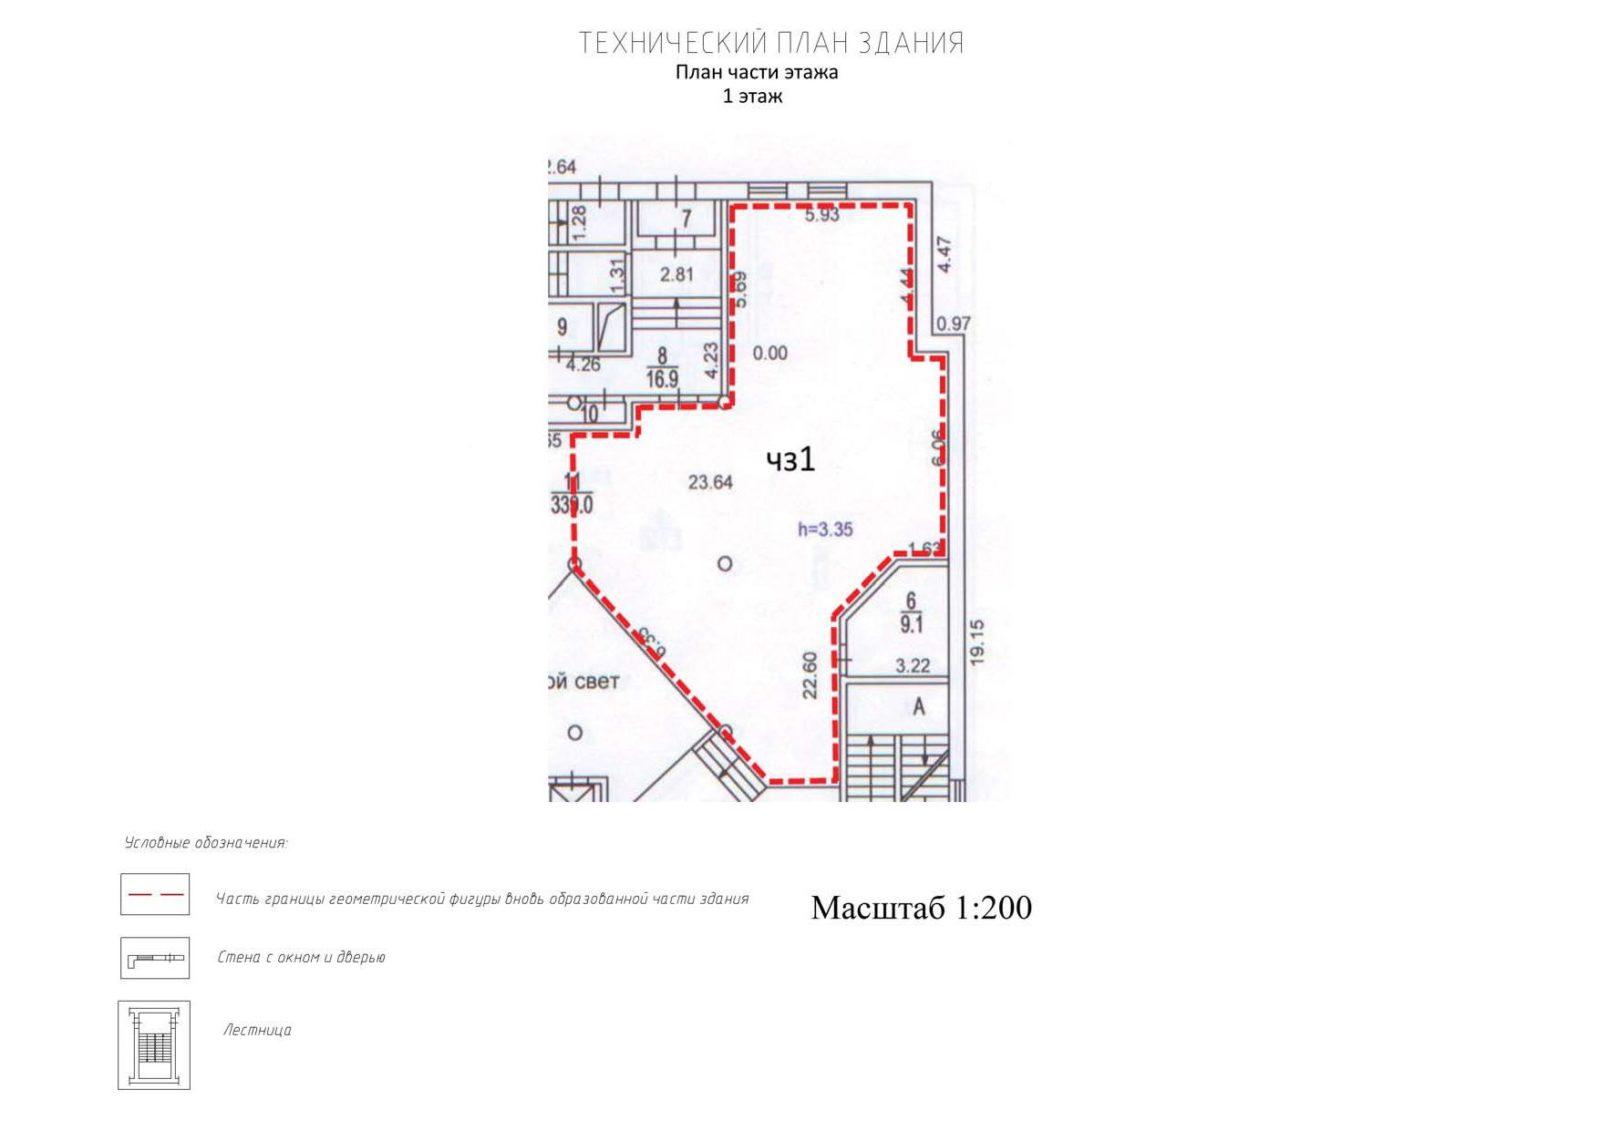 План части этажа для технического плана